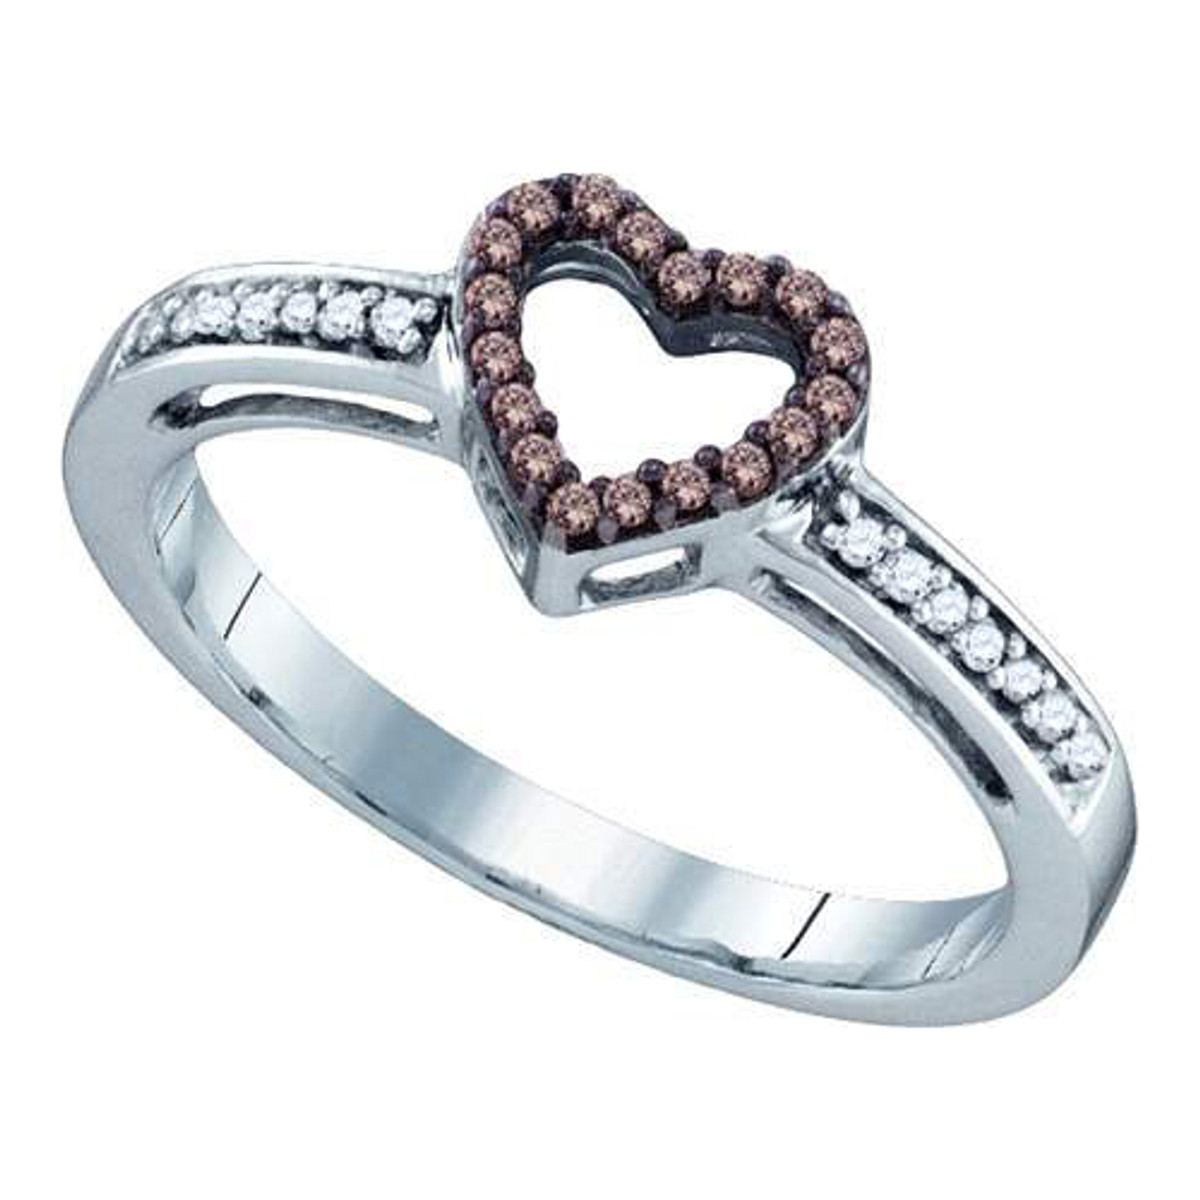 0.12CTW COGNAC DIAMOND LADIES HEART RING